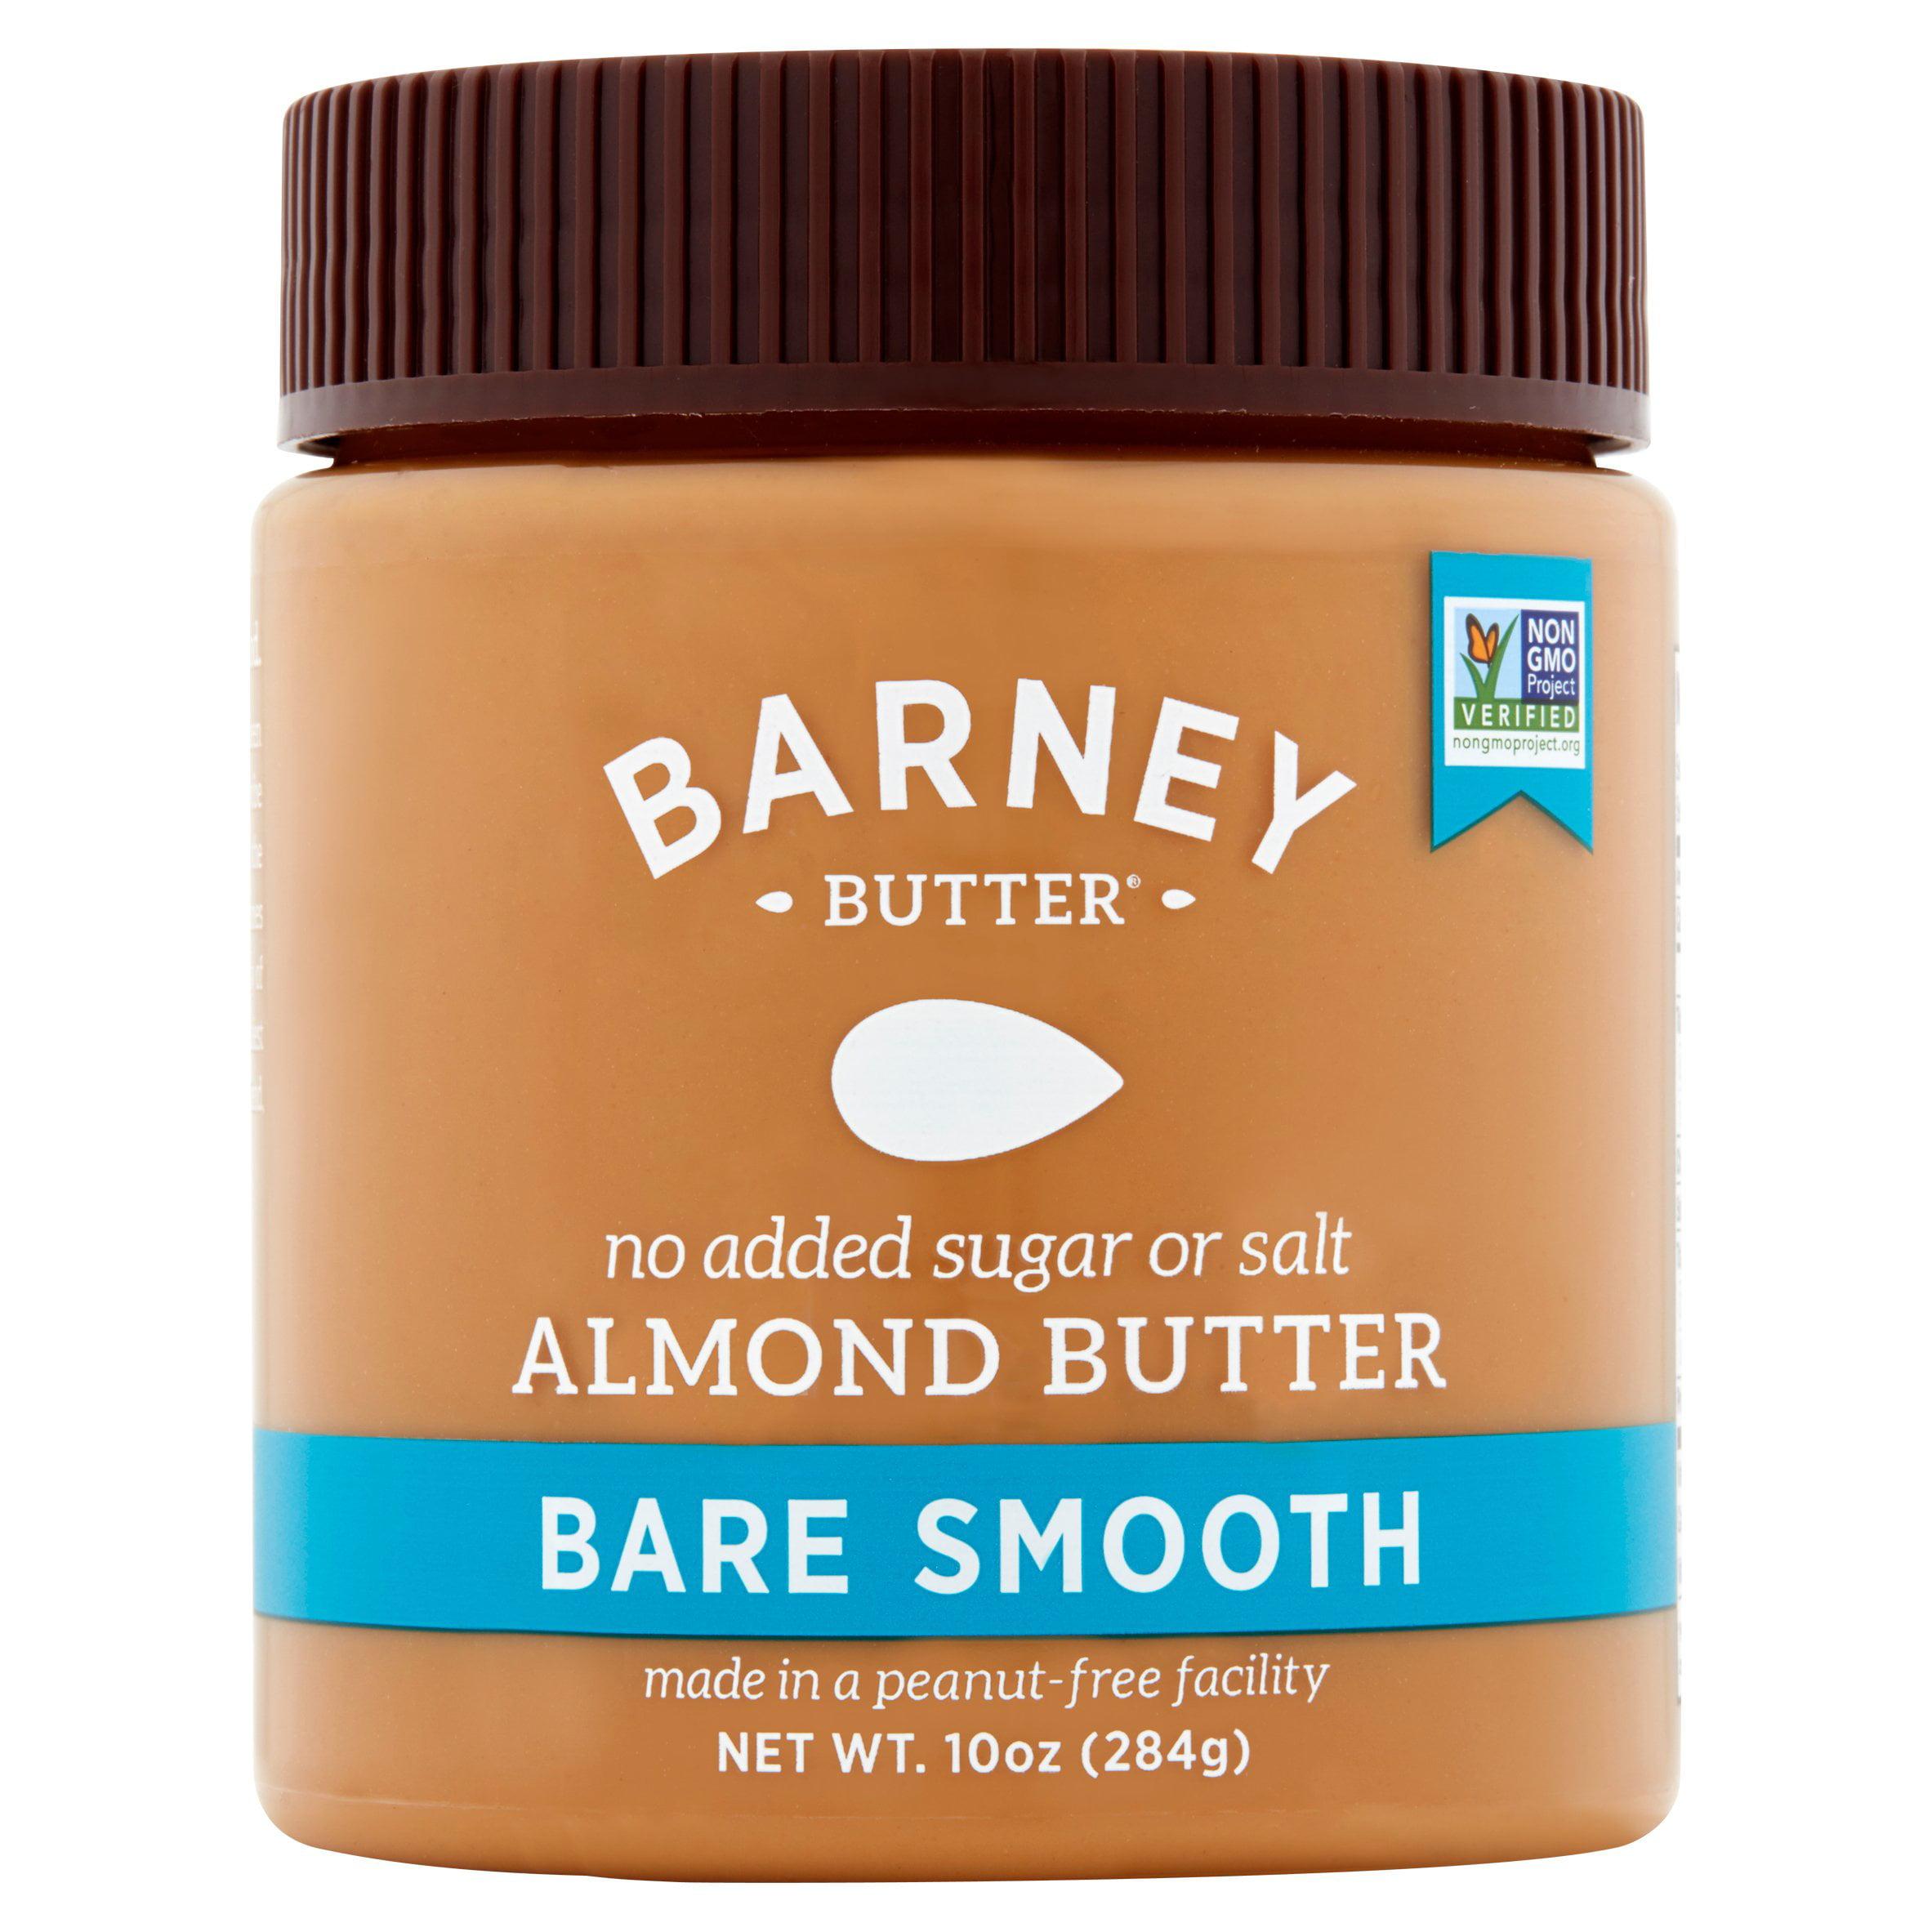 Barney Butter Bare Almond Butter, 10oz